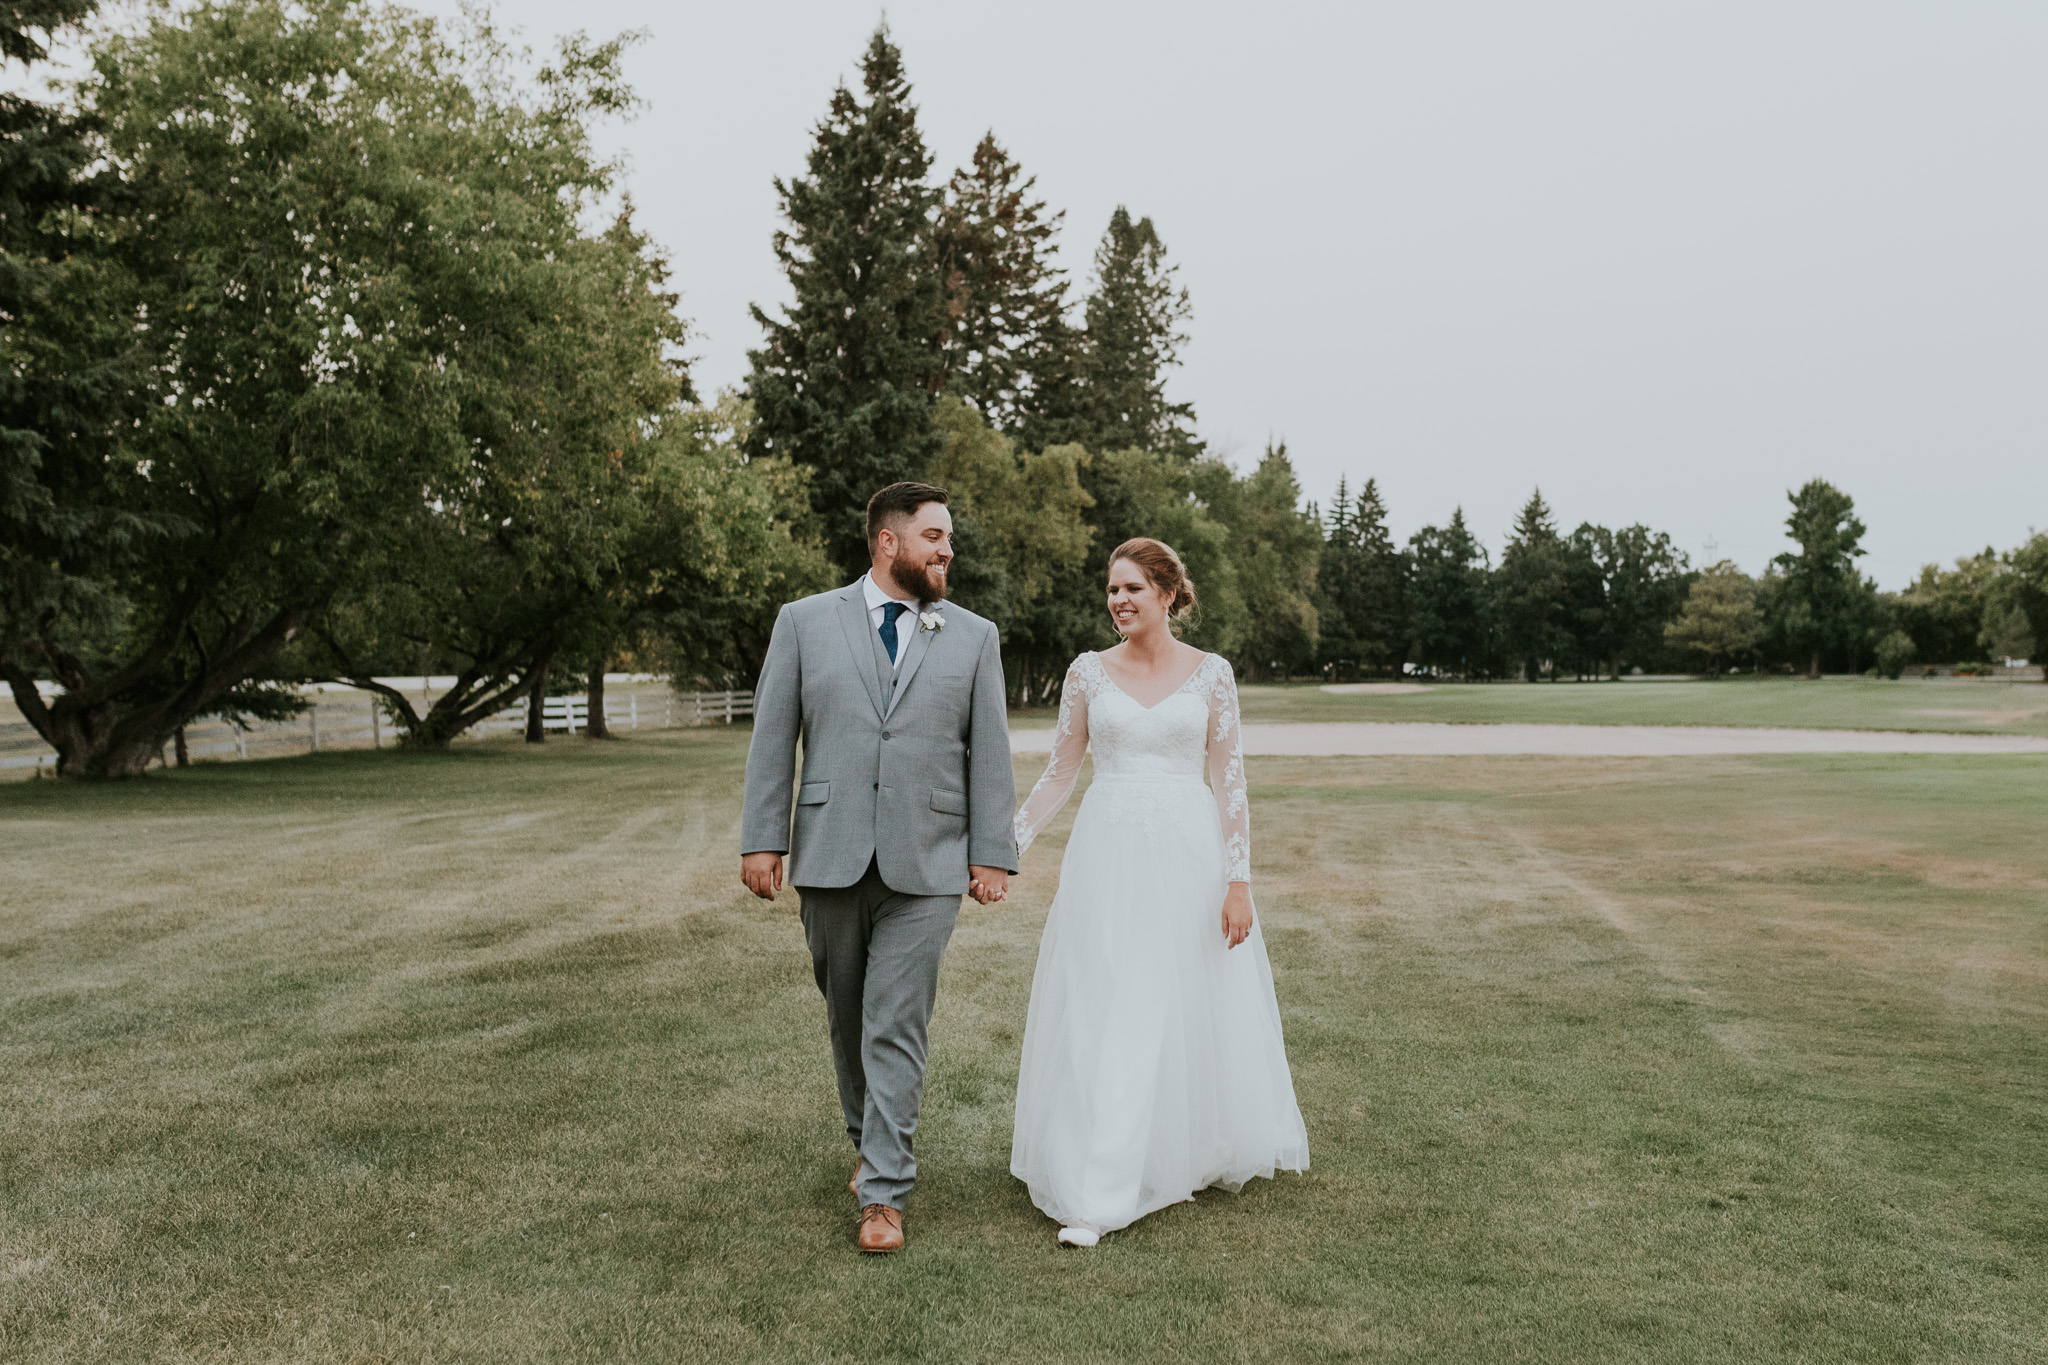 pine-ridge-golf-course-winnipeg-wedding-108.jpg